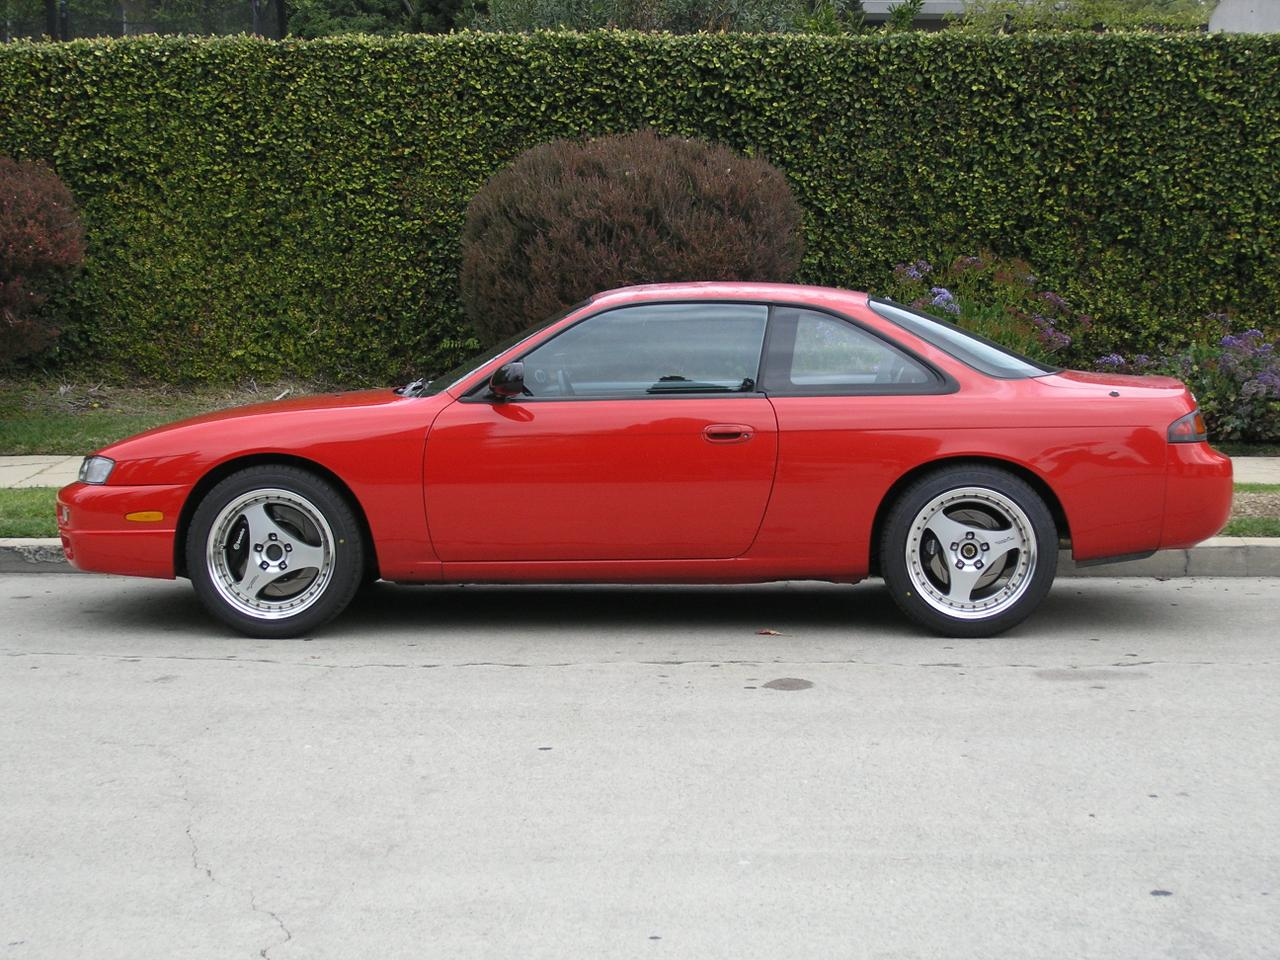 For Sale 1997 Nissan 240sx S14 Kouki Base Model 68 816miles